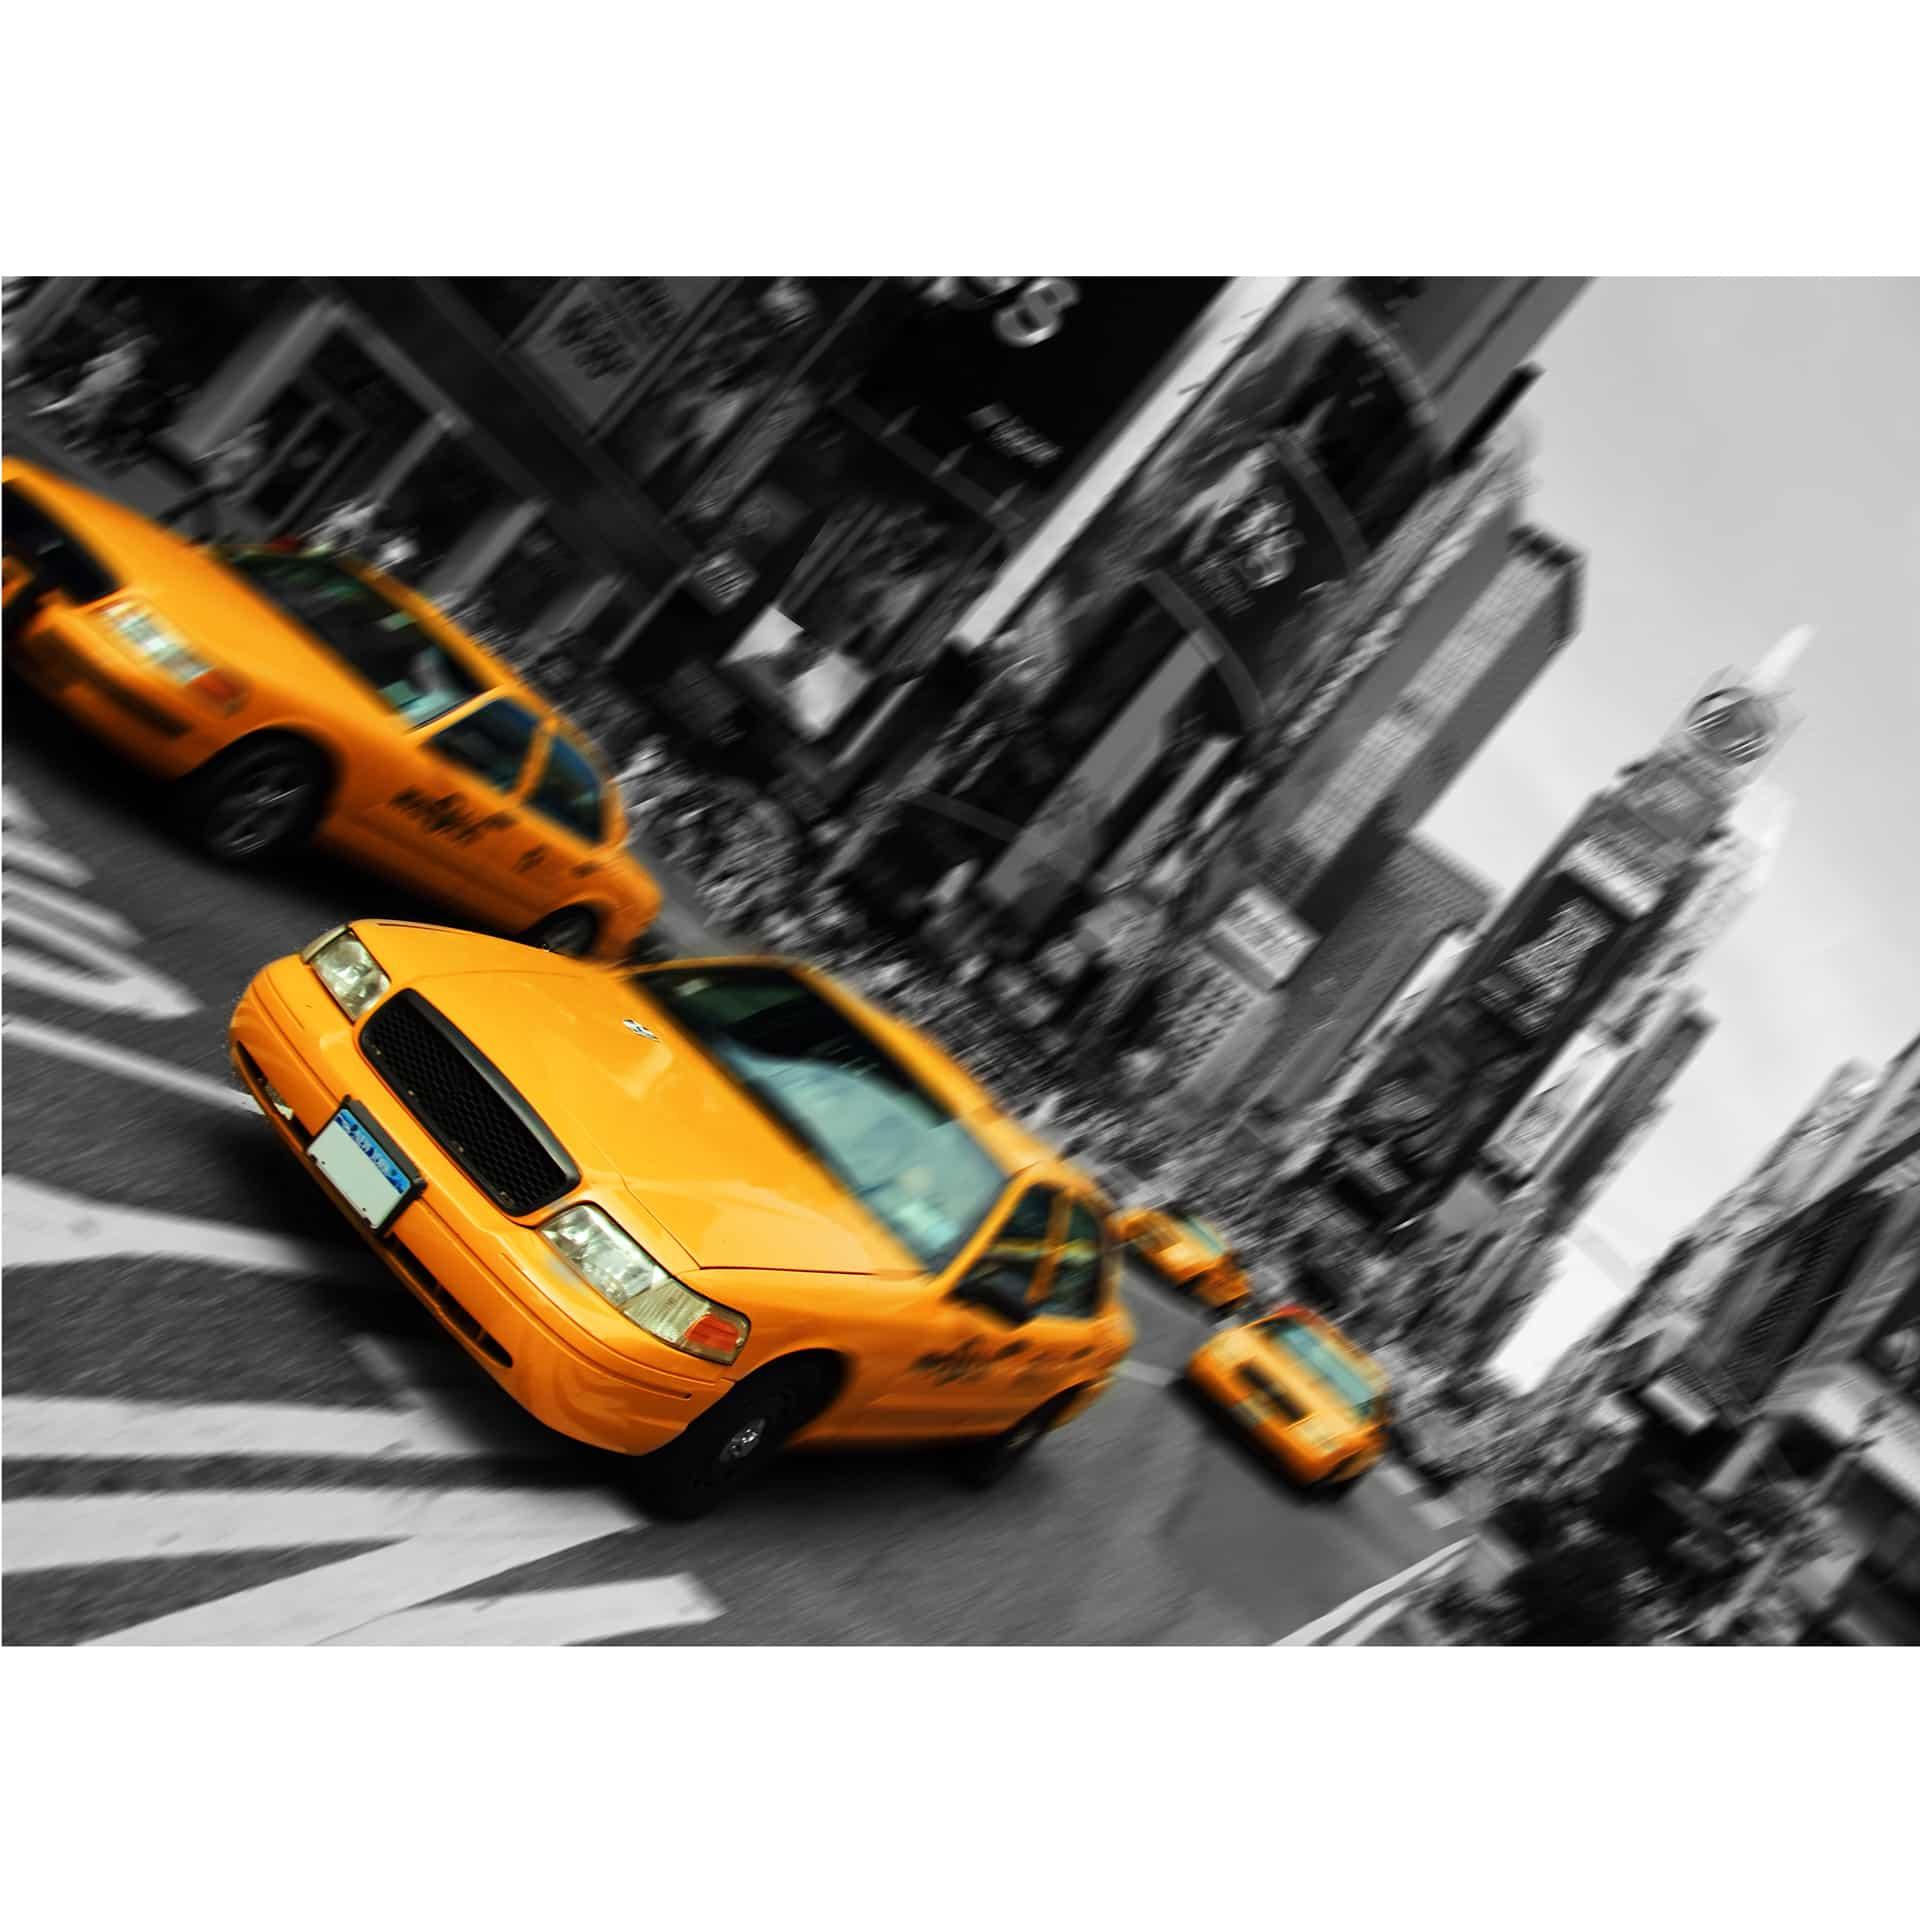 fototapete new york taxi von k l wall art wall. Black Bedroom Furniture Sets. Home Design Ideas